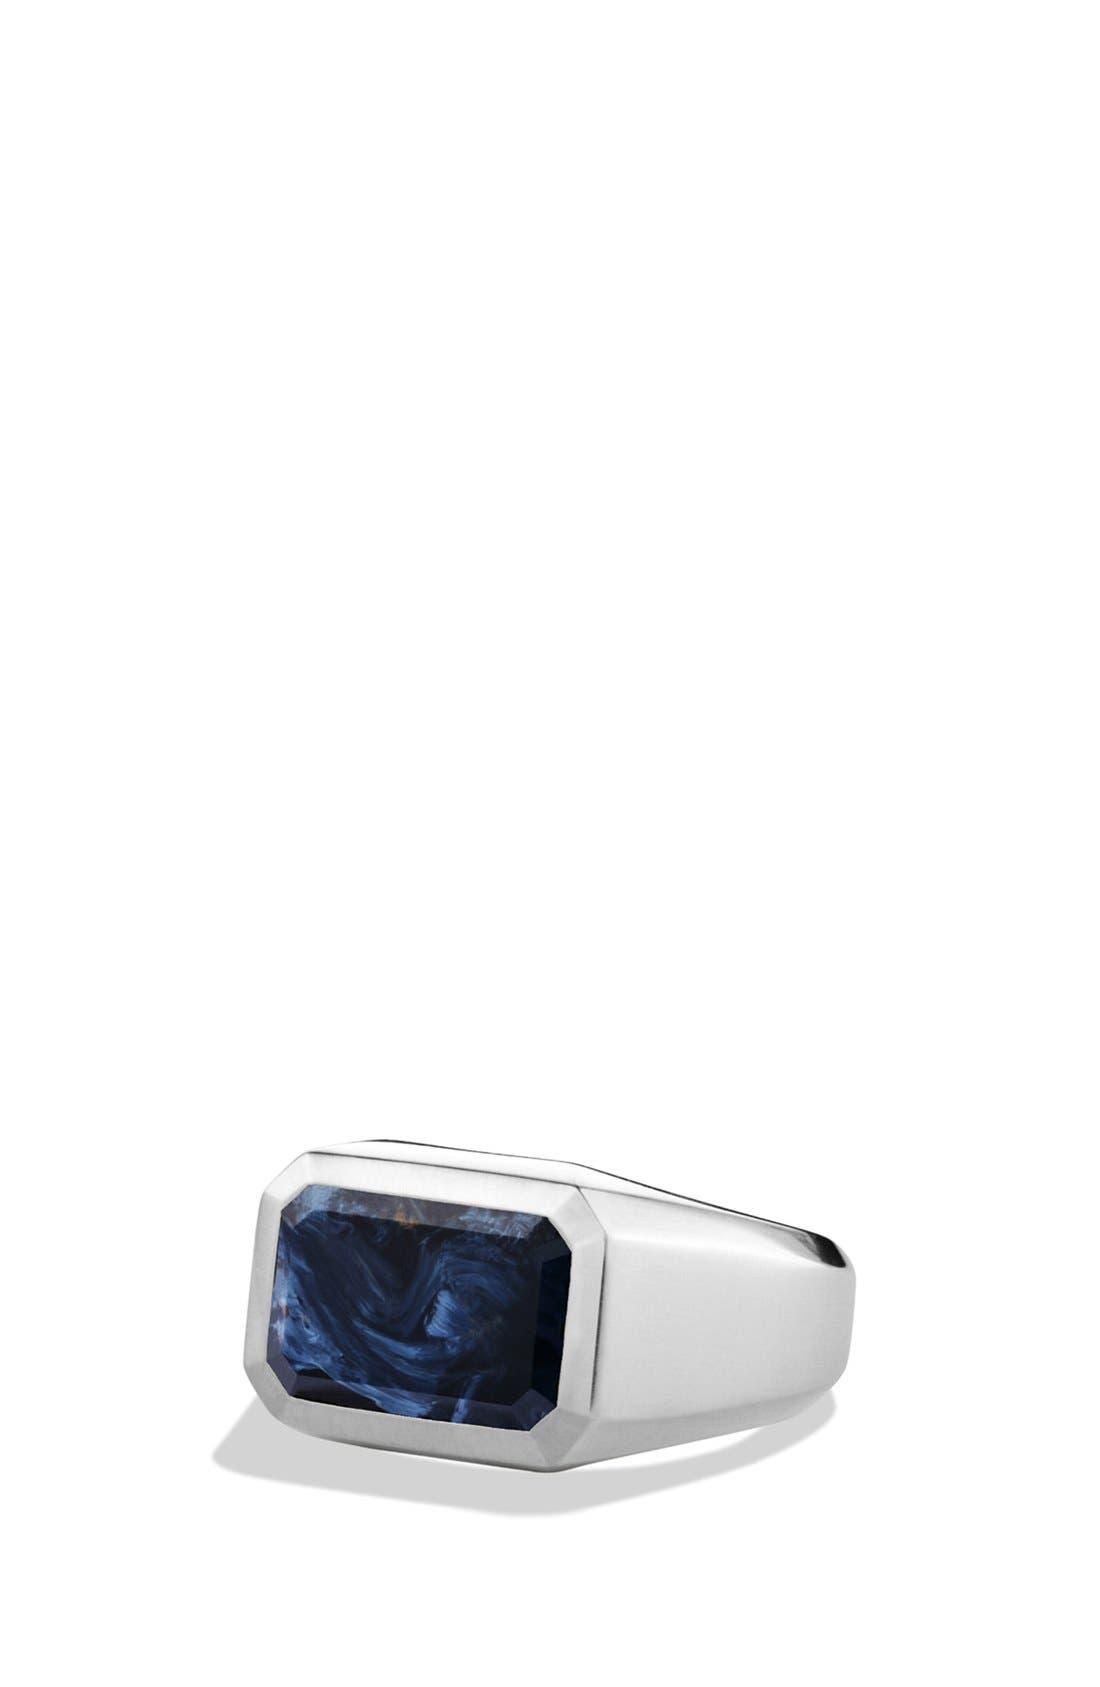 David Yurman 'Exotic Stone' Signet Ring with Semiprecious Stone